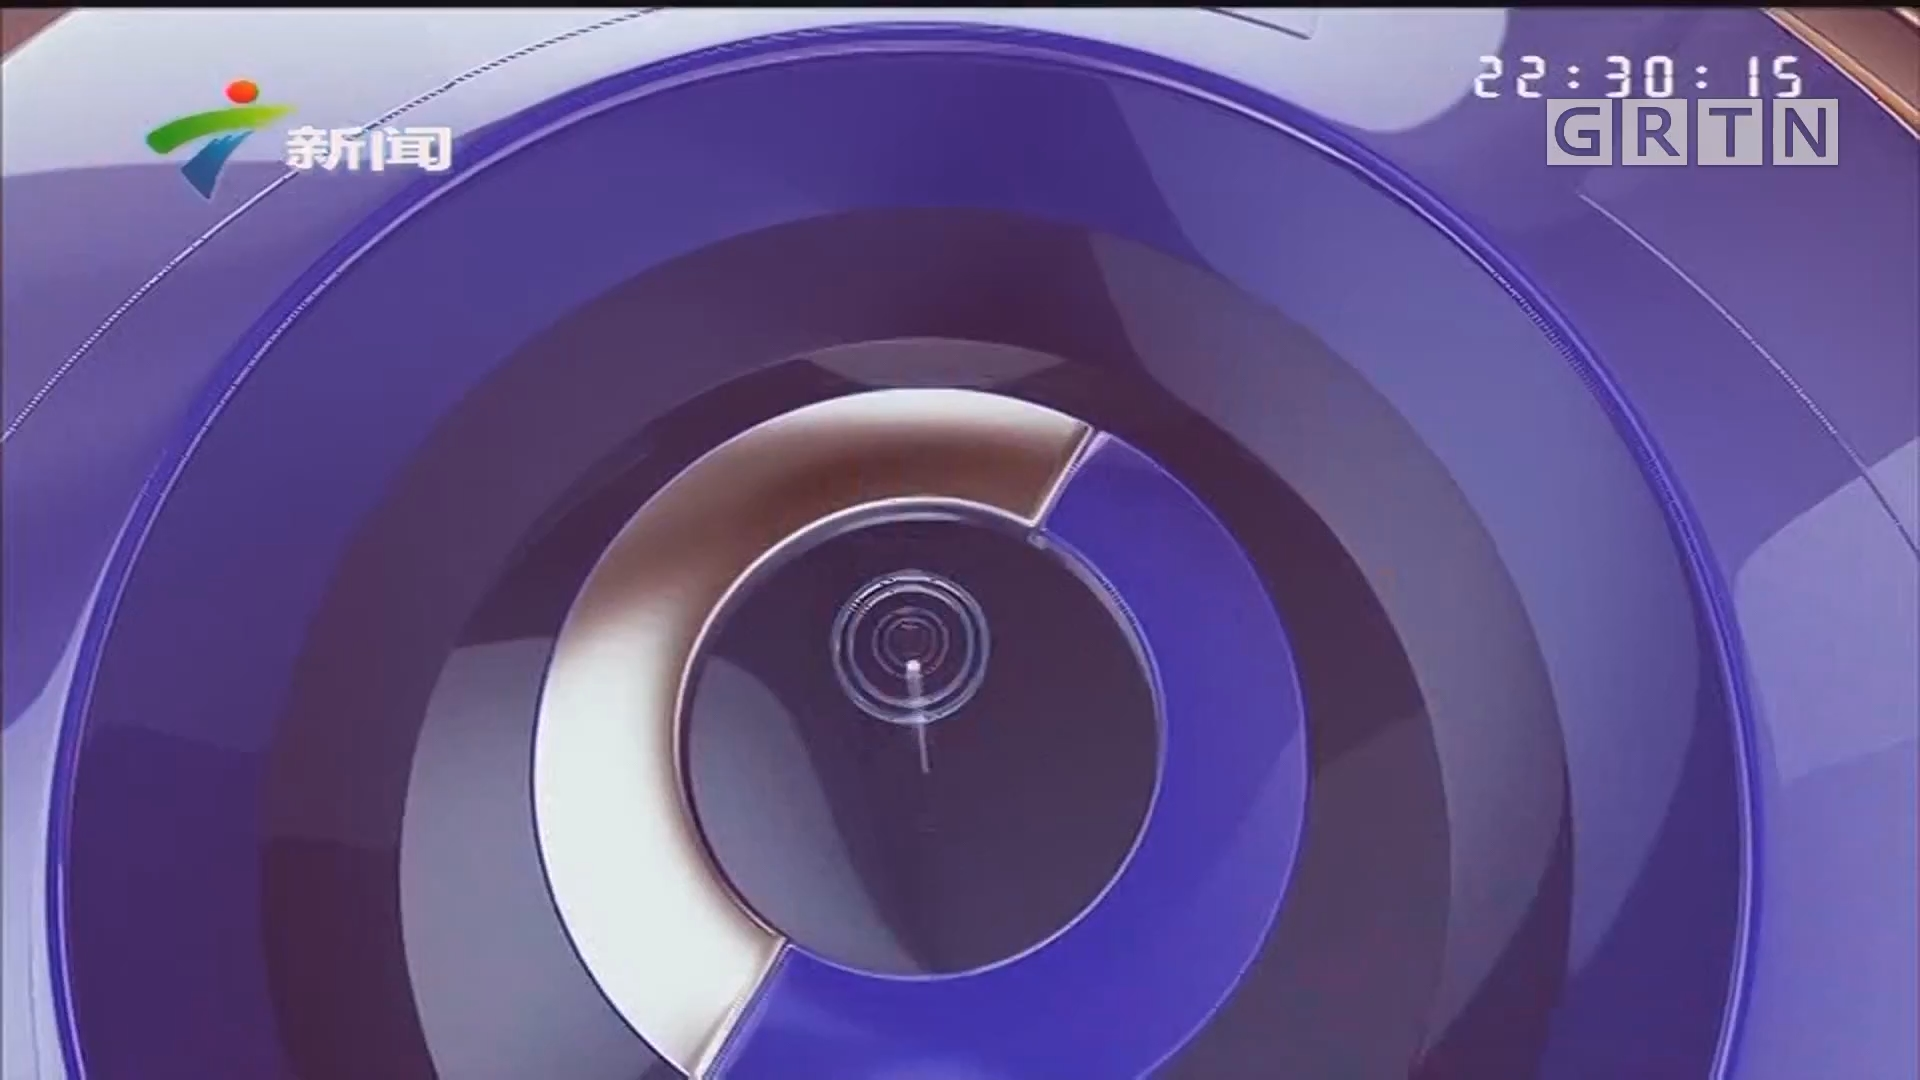 [HD][2019-09-28]新闻夜线:庆祝新中国成立70周年 向祖国报告!港澳青年:深受鼓舞 与祖国共奋进